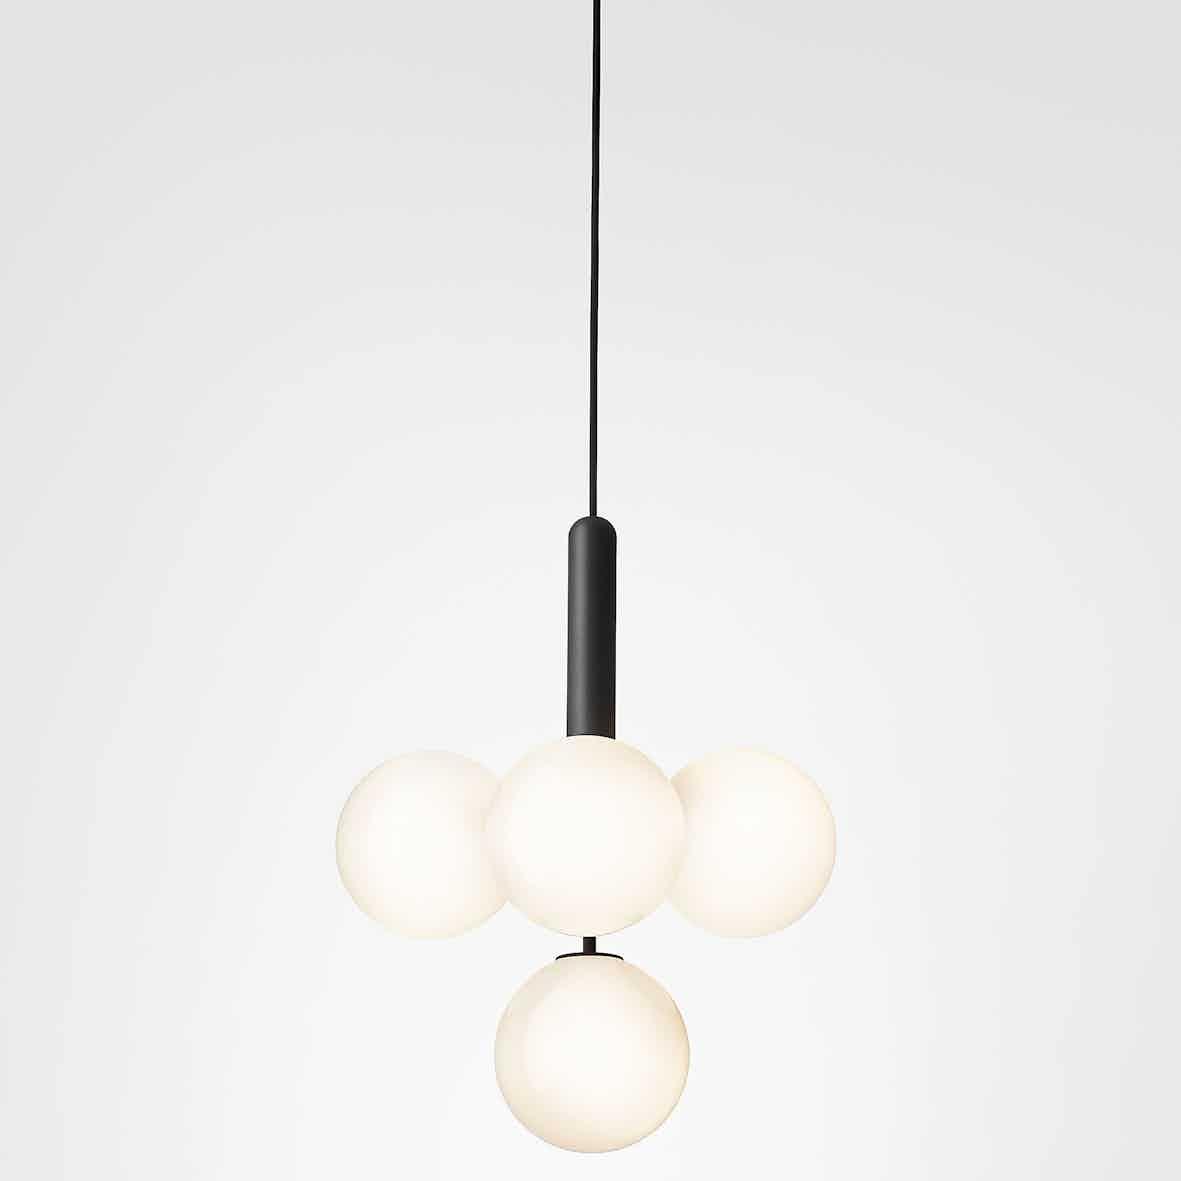 Nuura opal miira 4 chandelier haute living